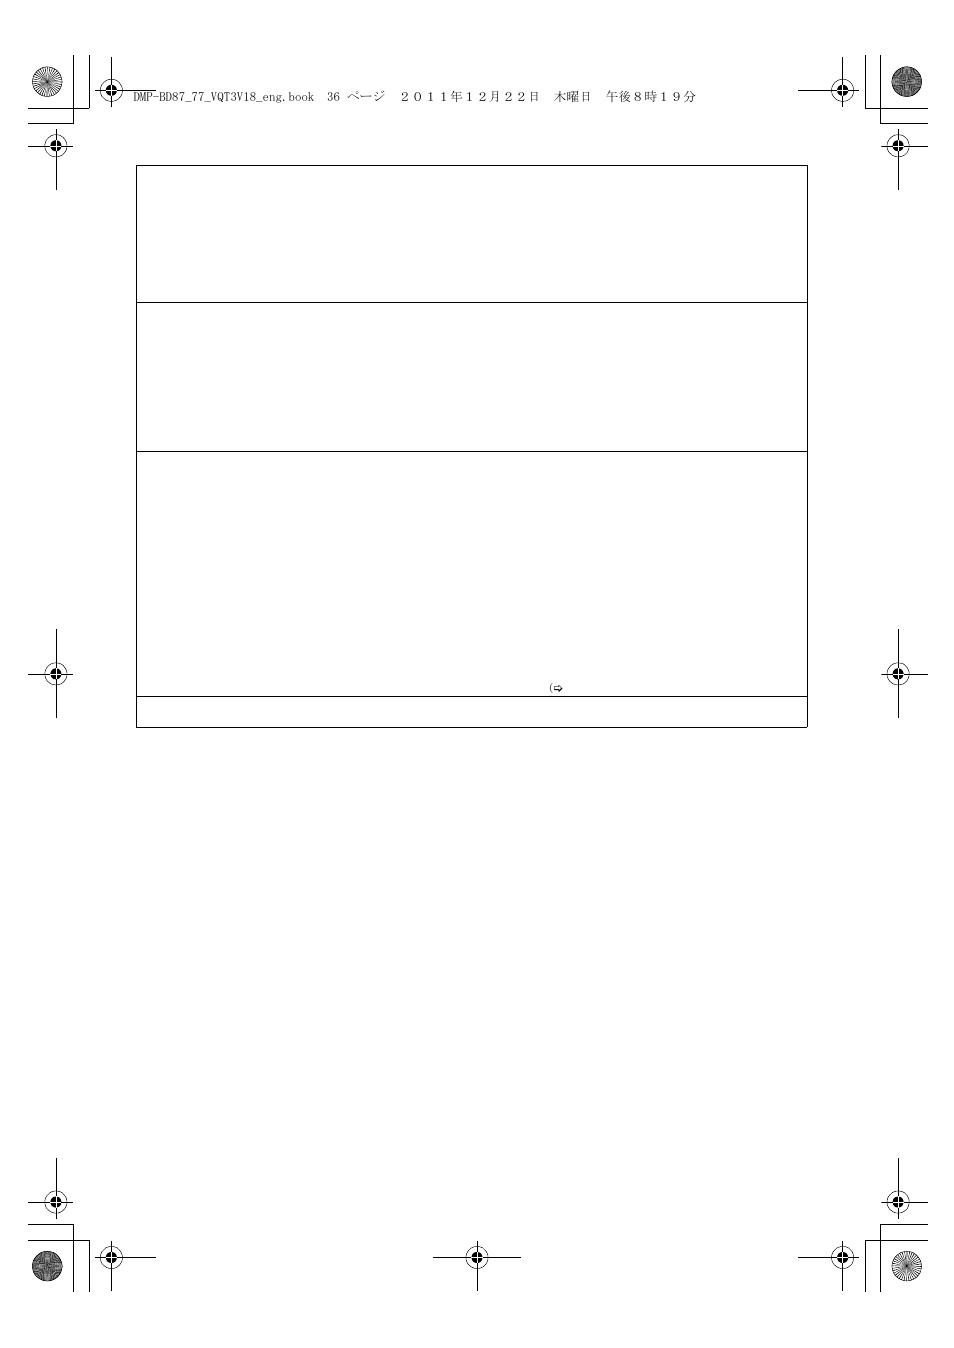 panasonic dmp bd871 user manual page 36 40 original mode rh manualsdir com Panasonic Wiring Diagram Panasonic Wiring Diagram